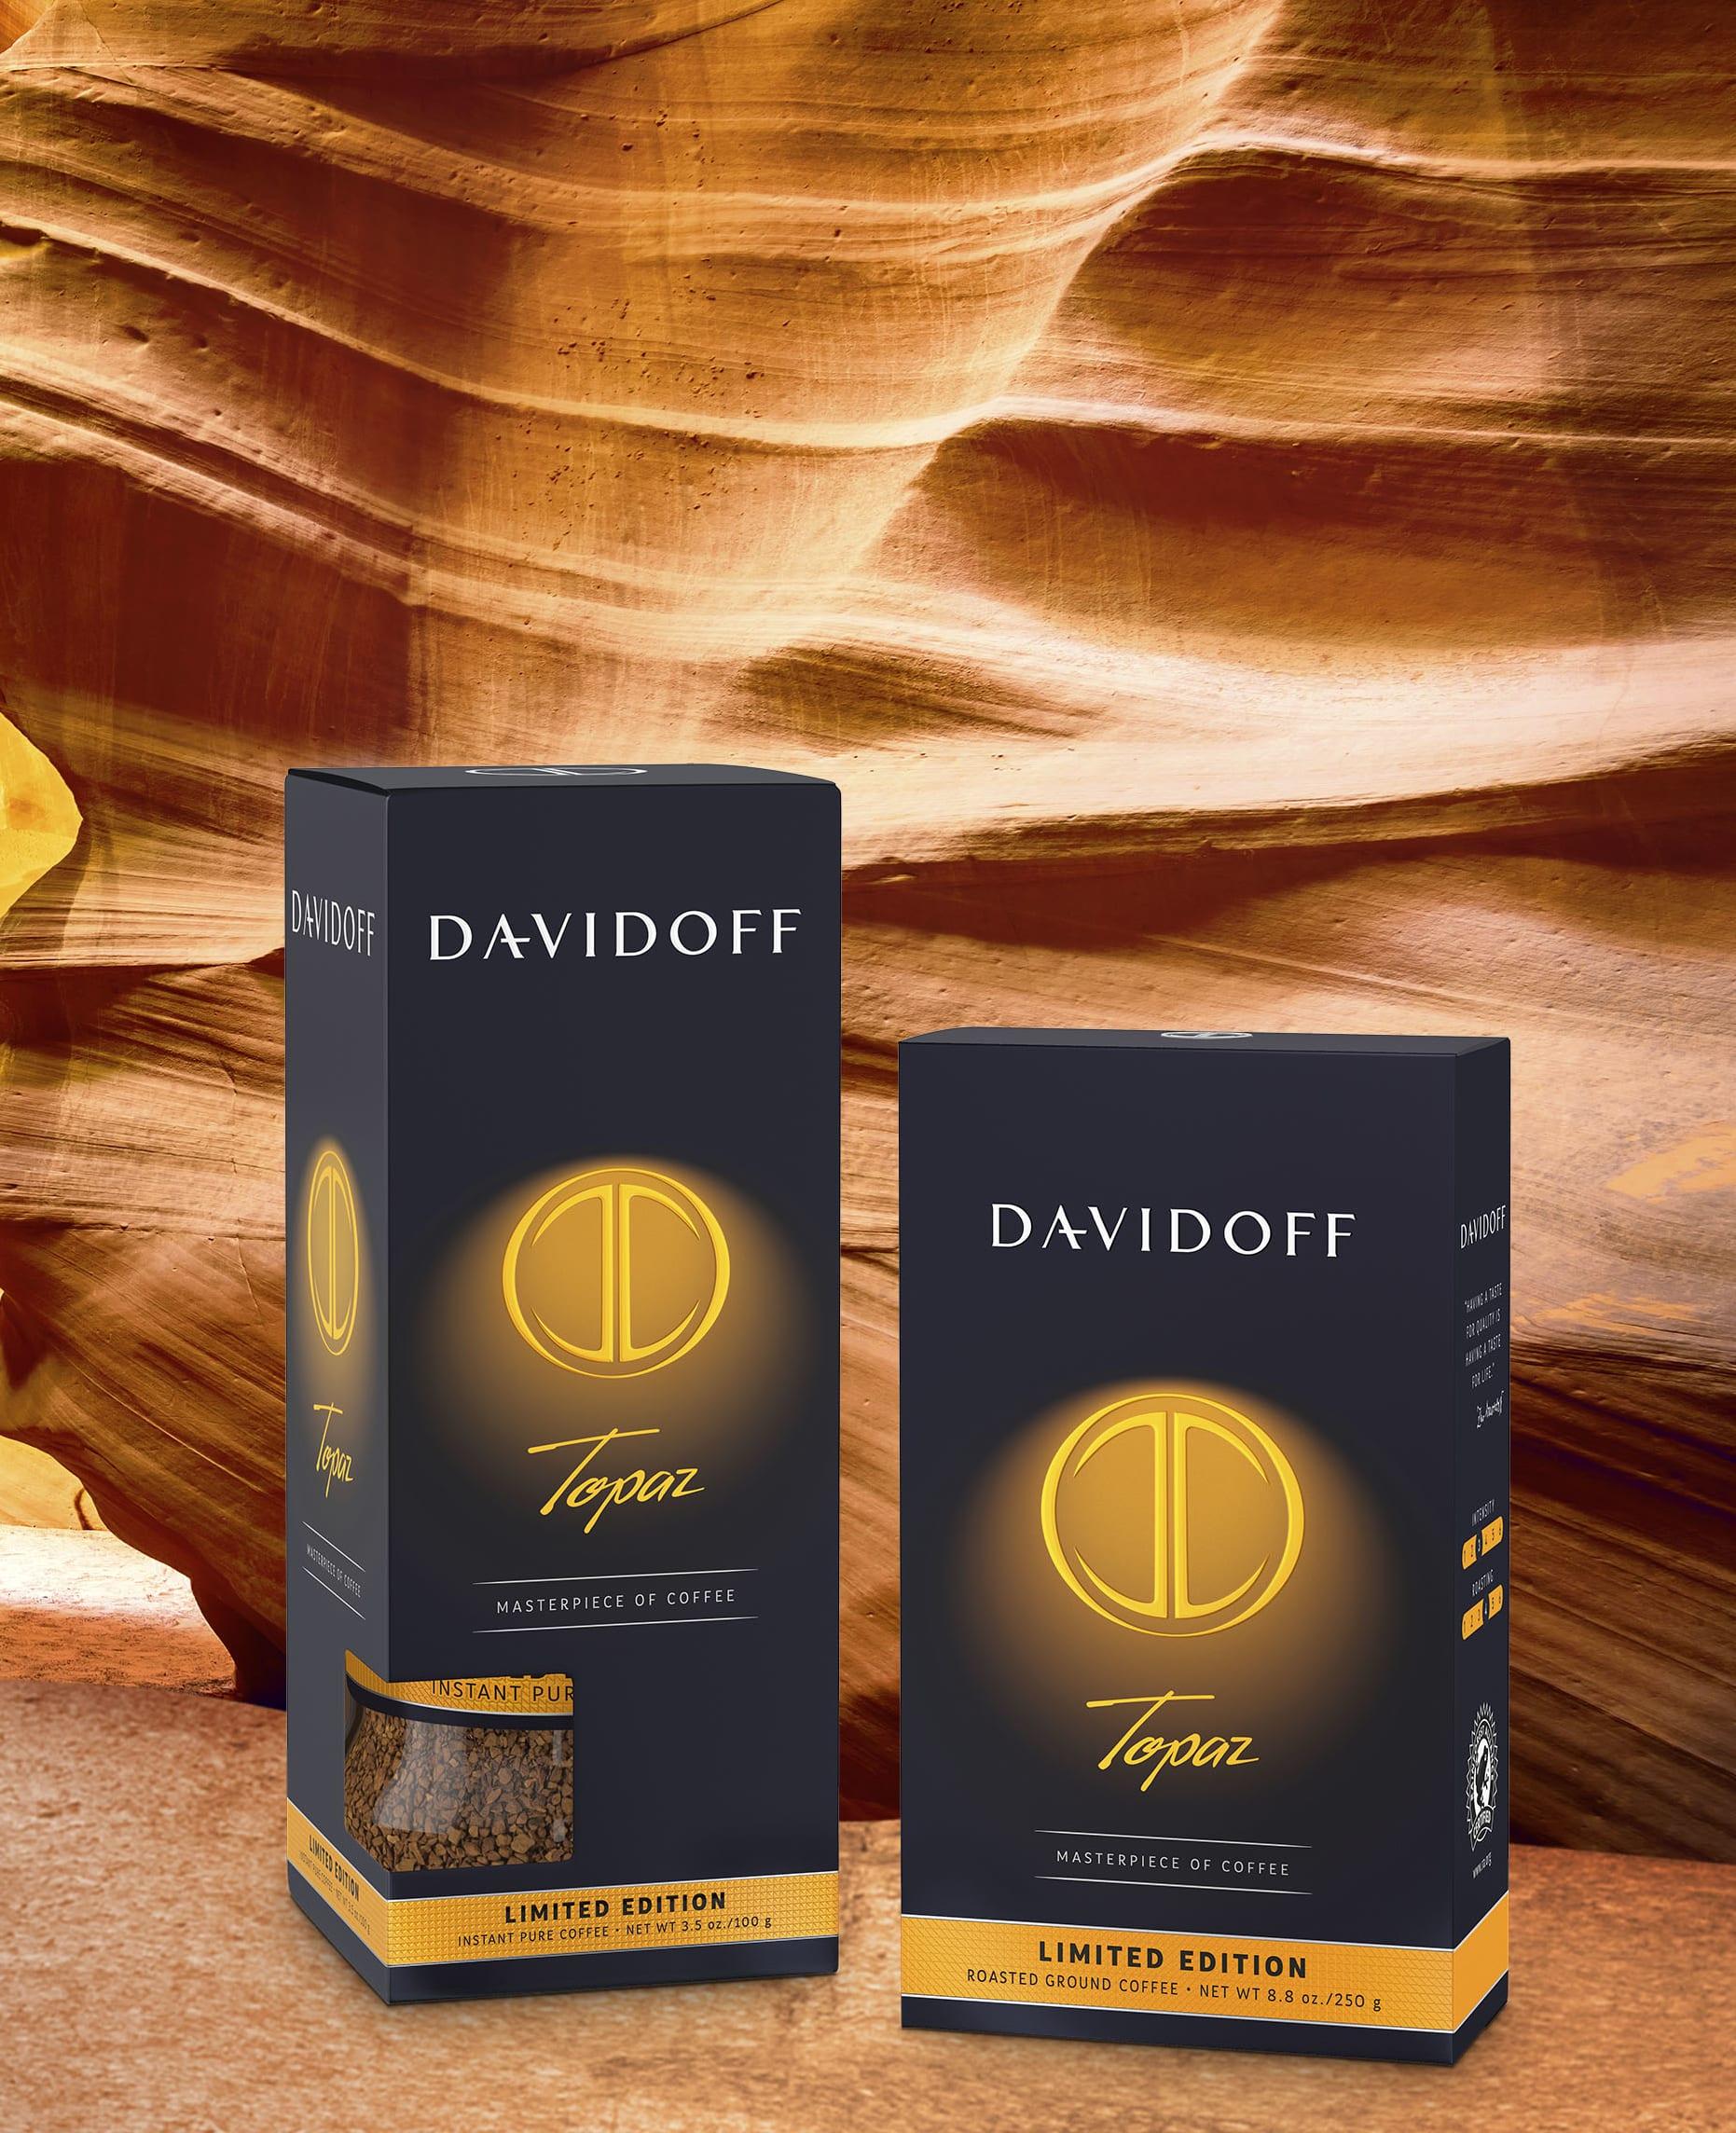 DAVIDOFF coffee - limited edition Topaz